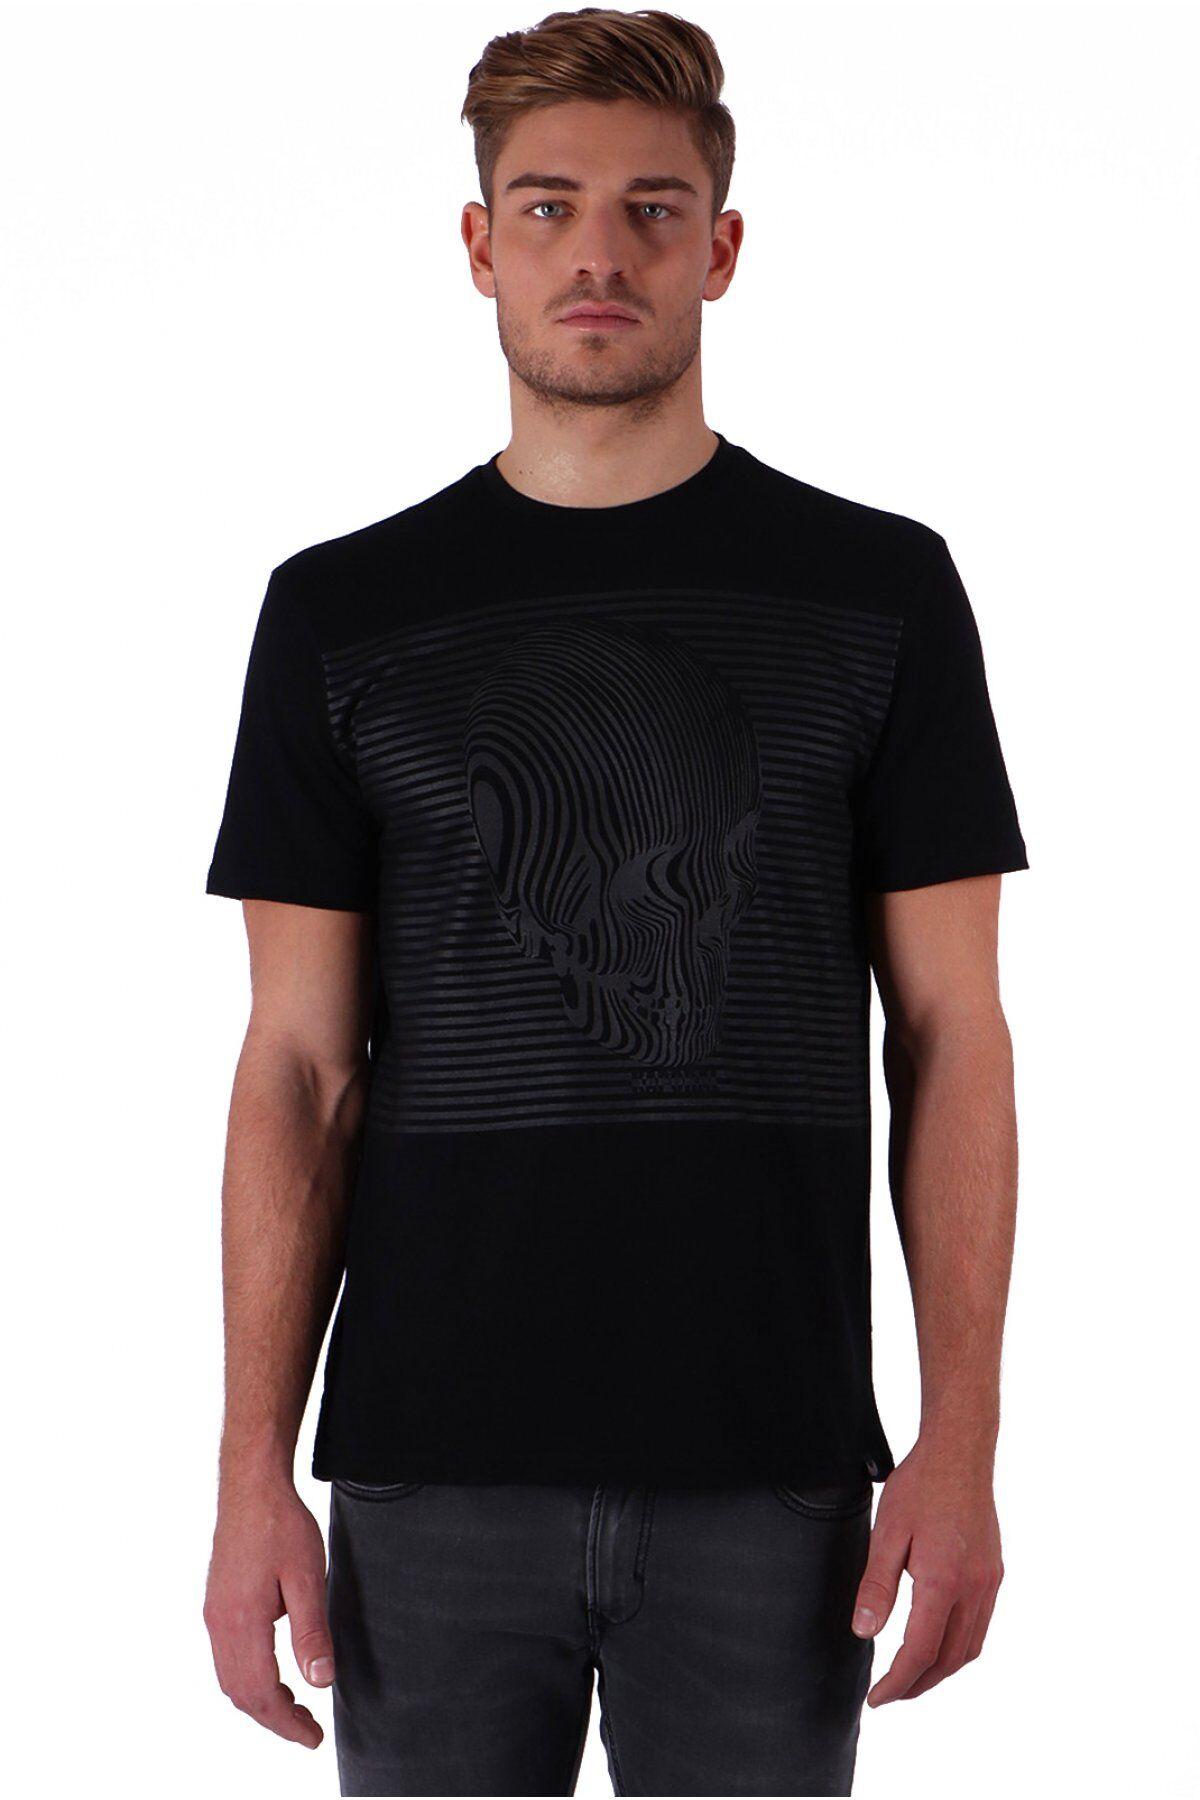 Kaporal Tee Shirt Coton Printé Nixon  -  Kaporal